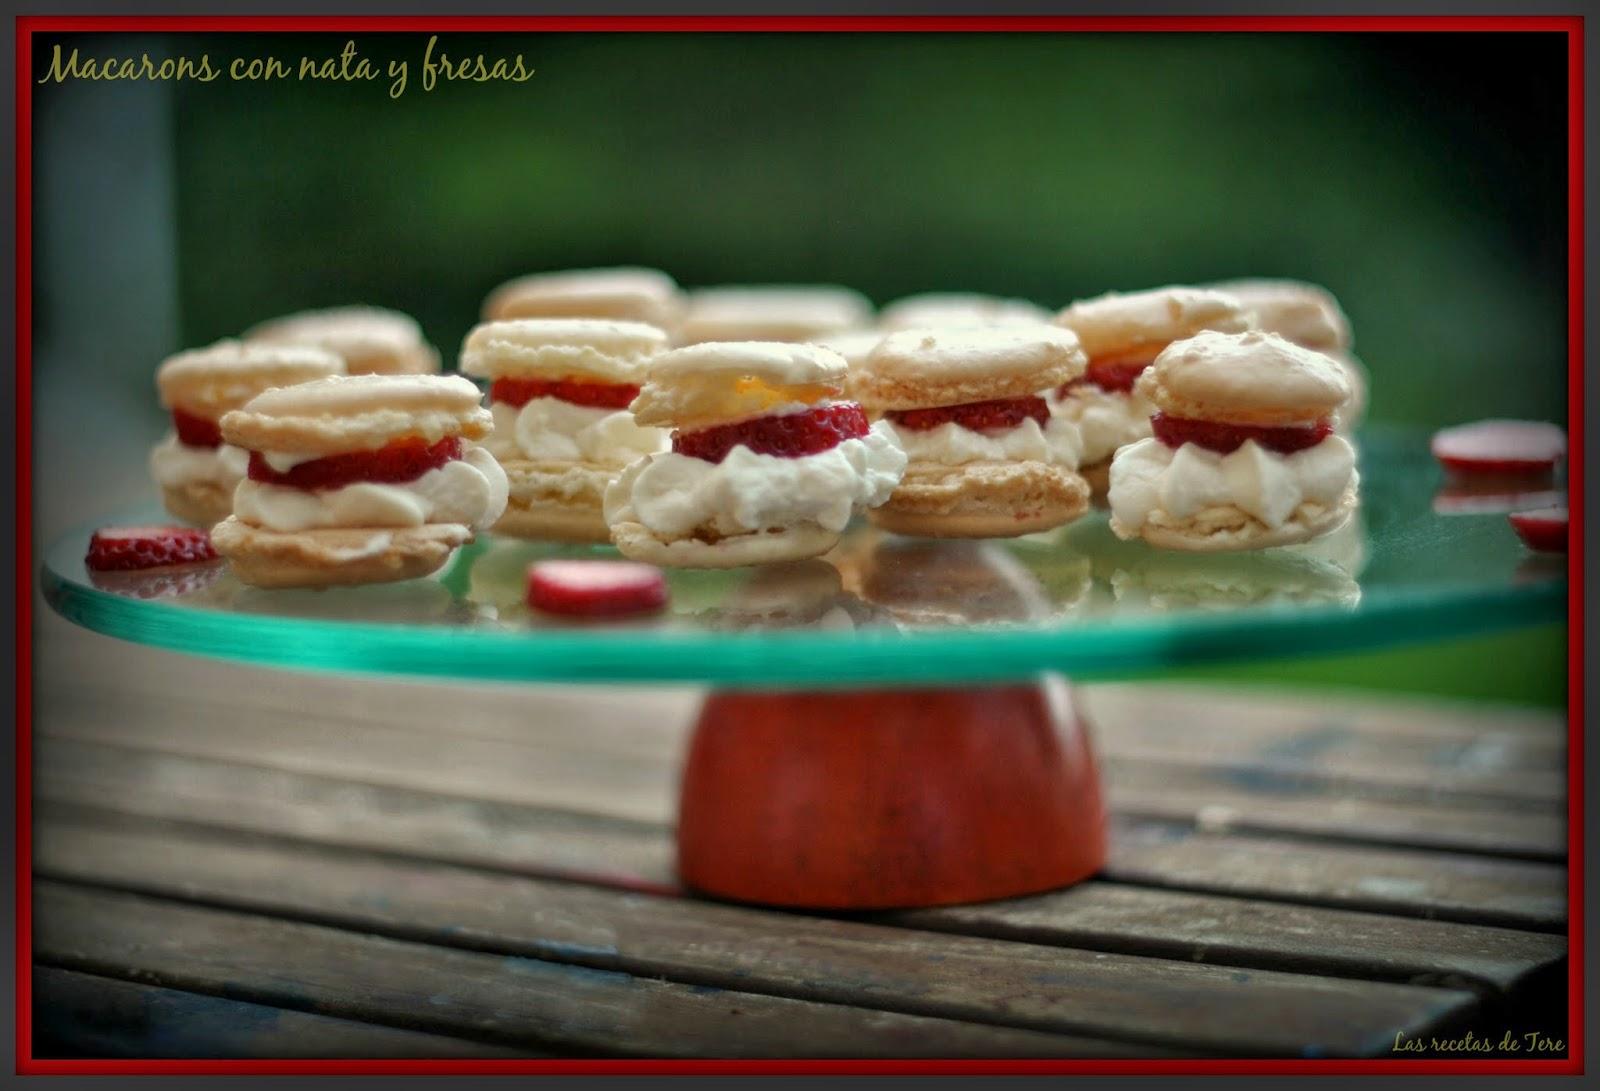 Macarons con nata y fresas 06